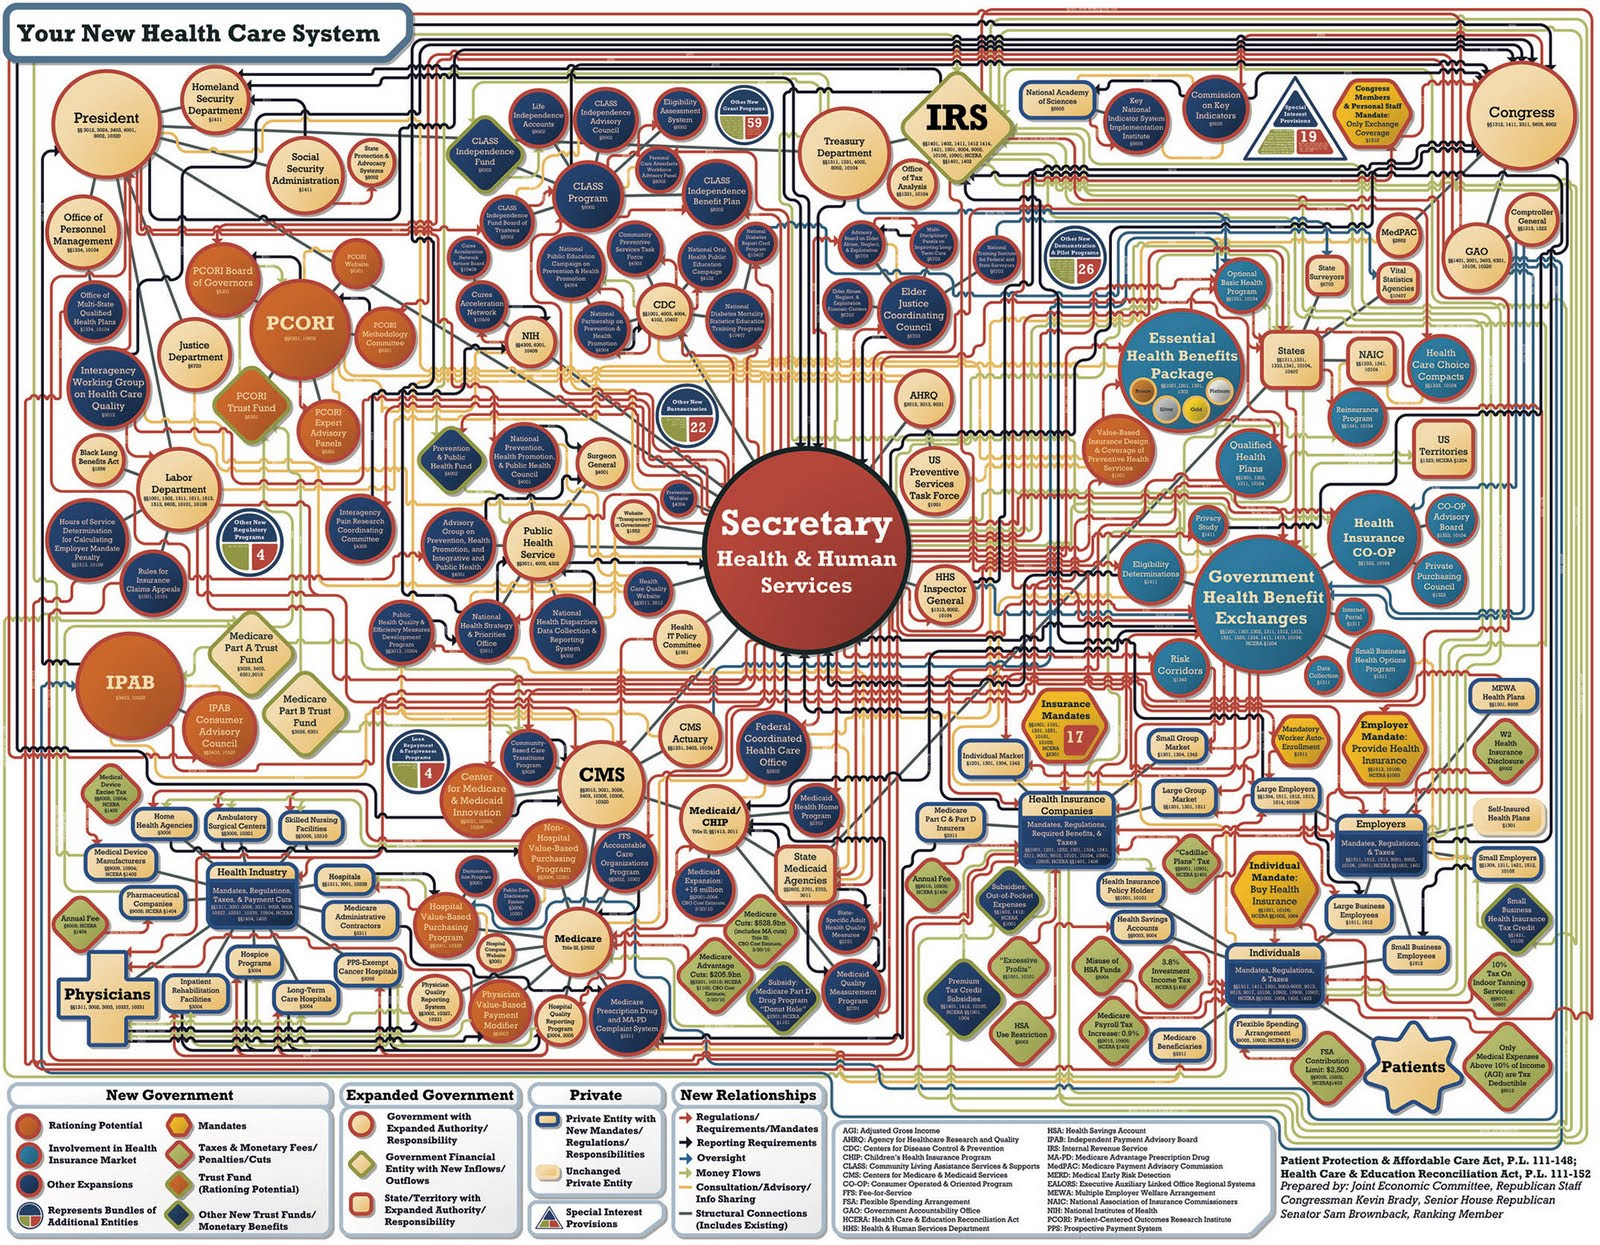 Rep. Kevin Brady's Obamacare Organization Chart